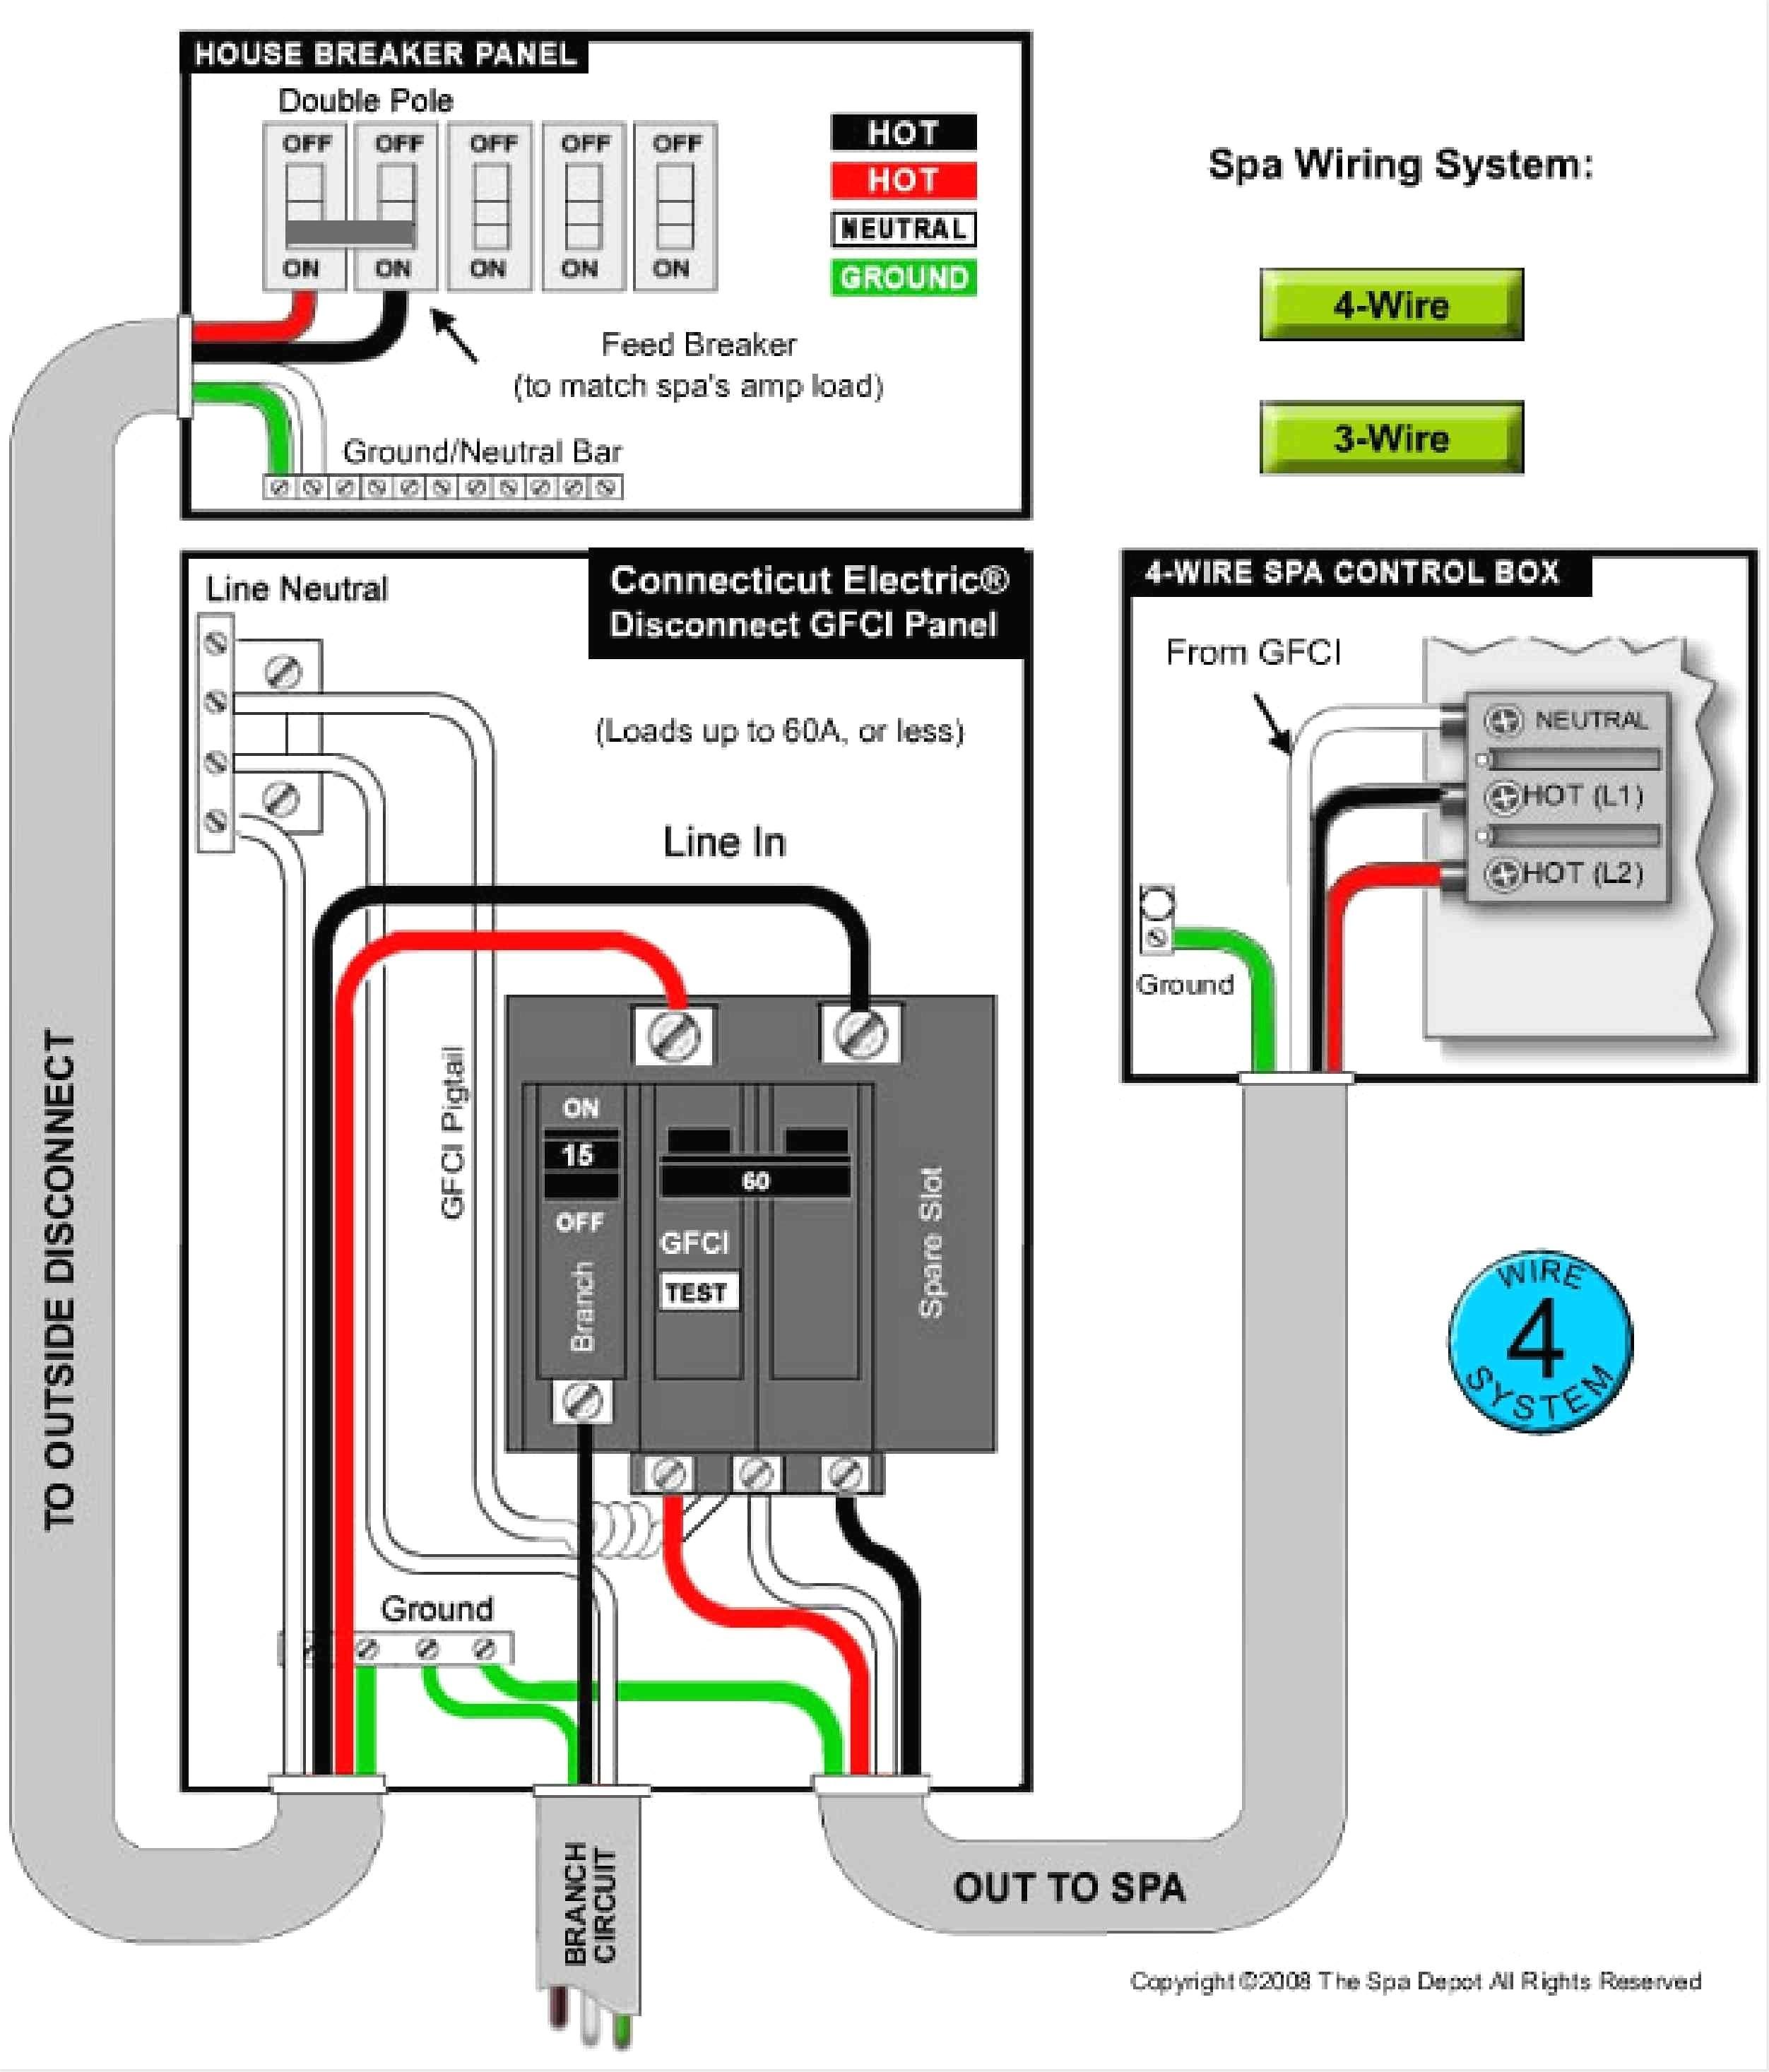 4 Wire 220 Volt Wiring Diagram Unique | Wiring Diagram Image